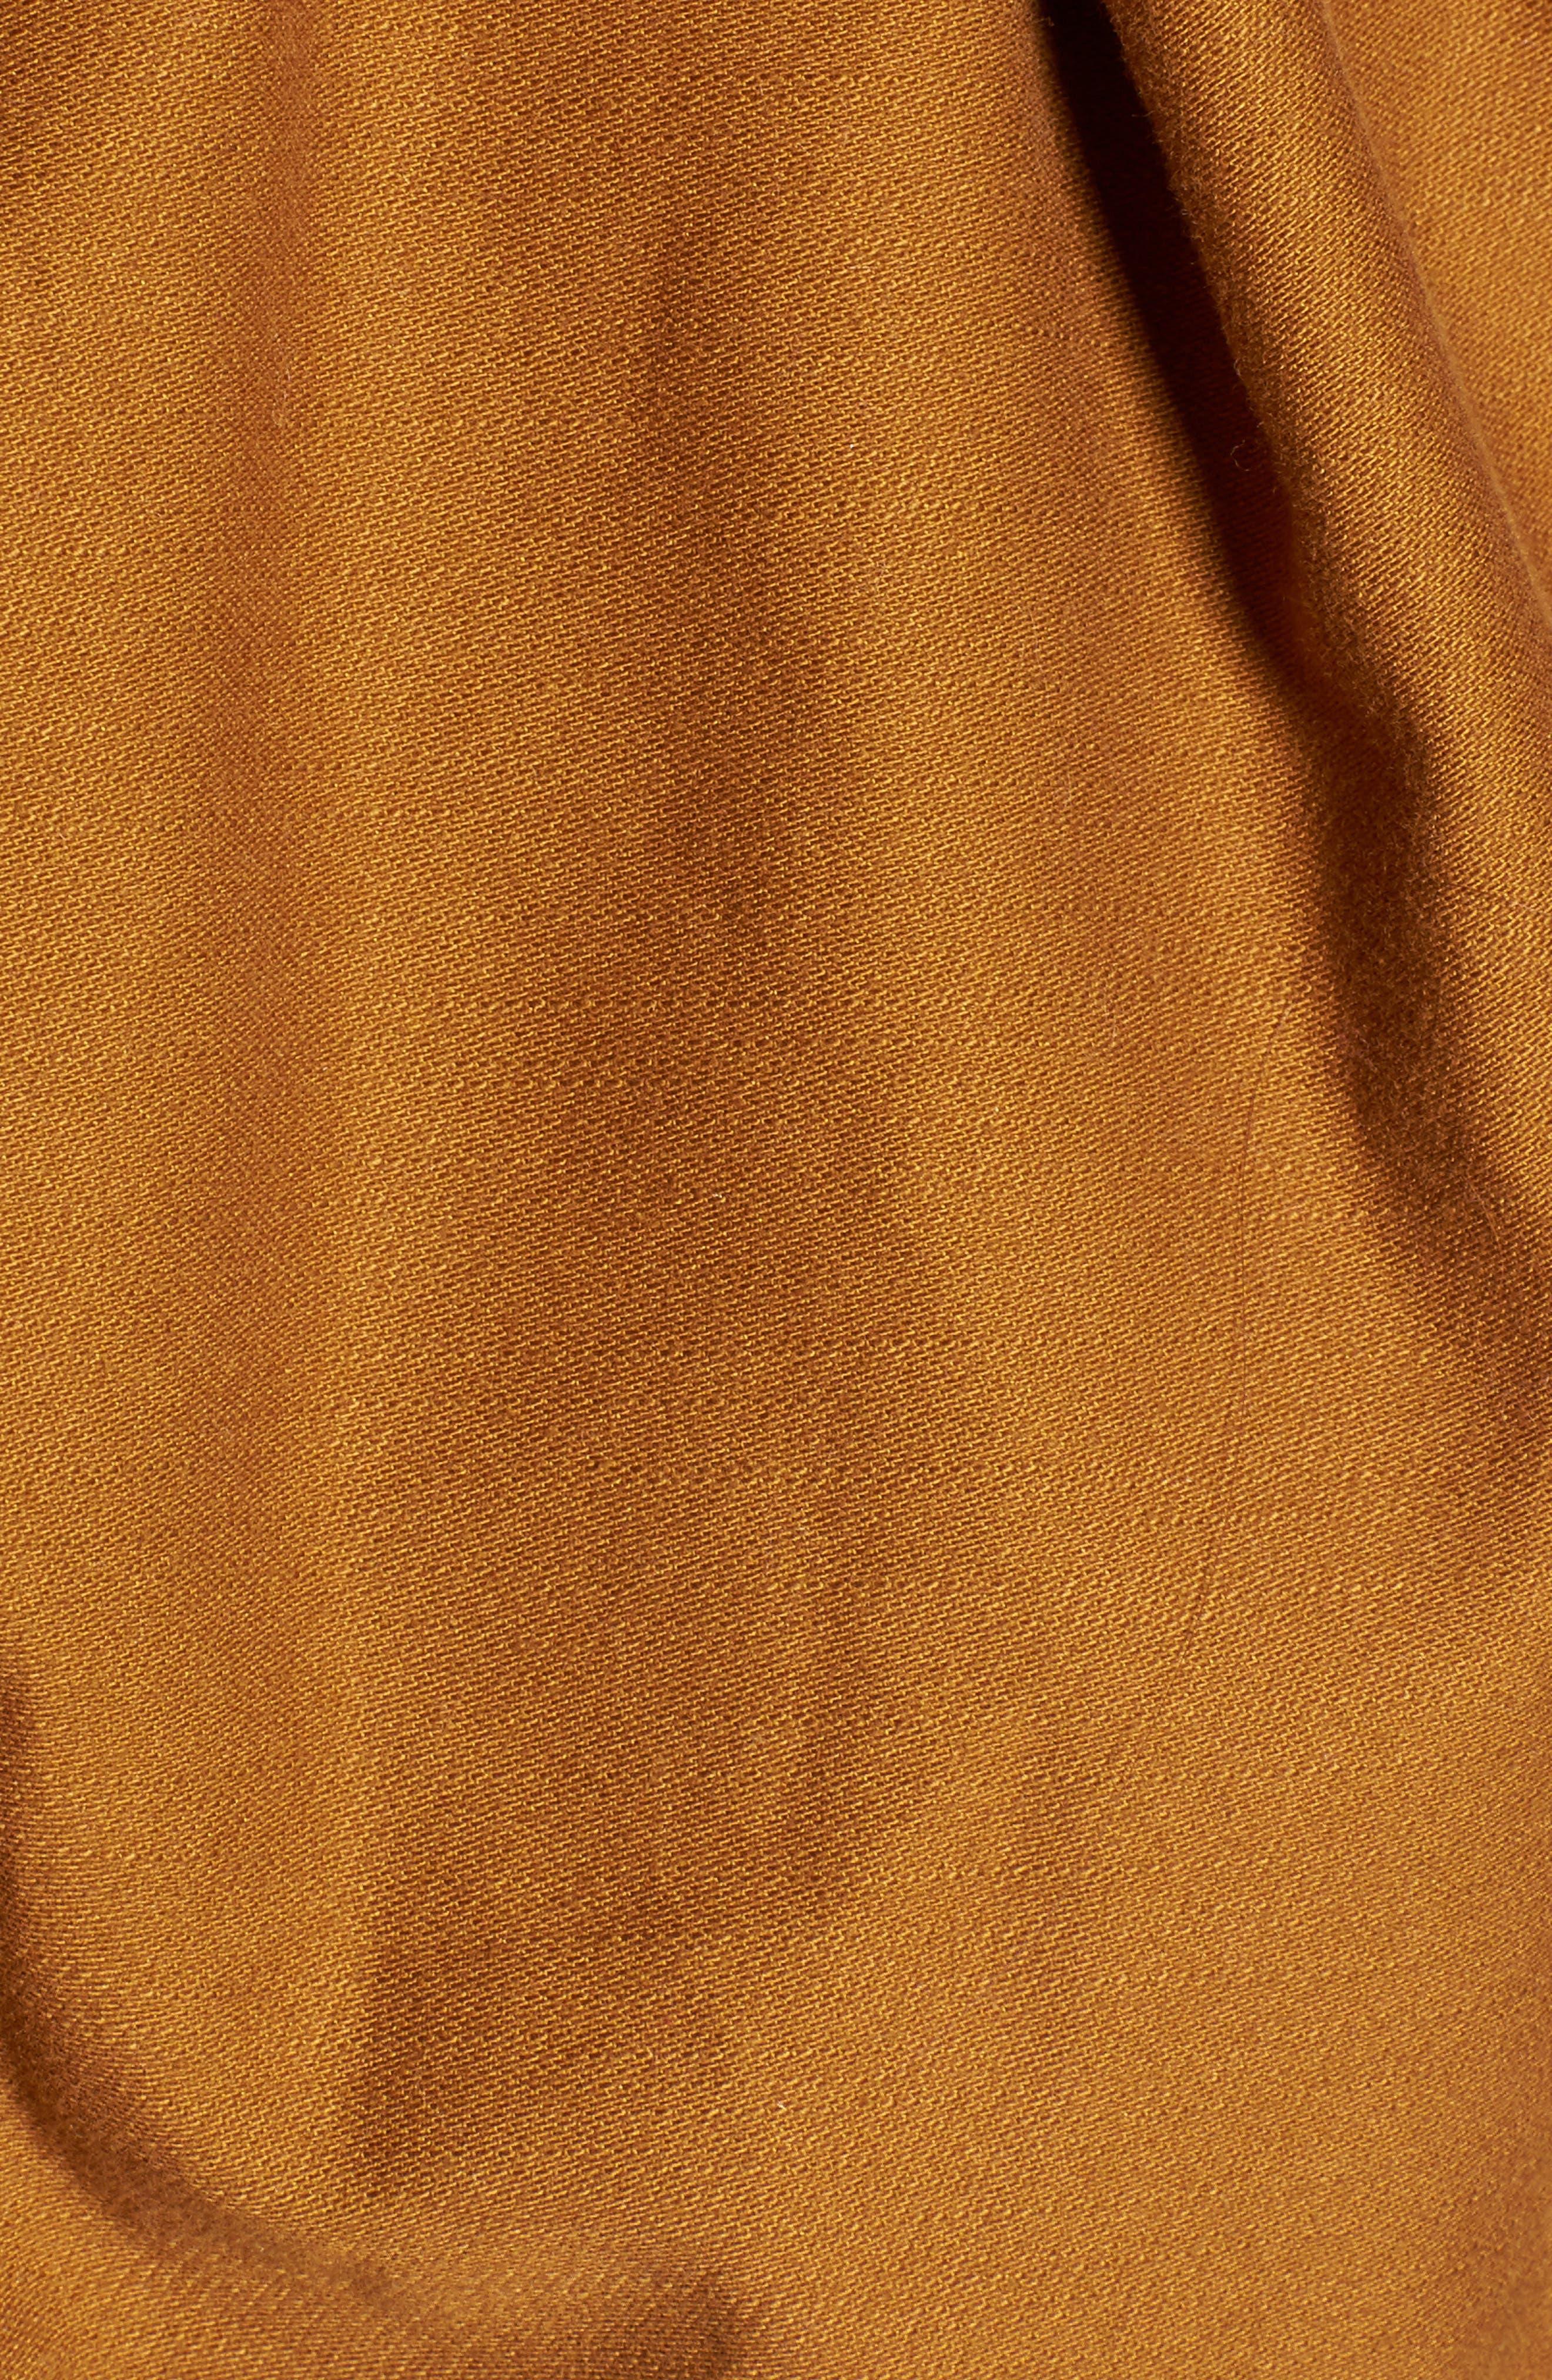 Kimono Jacket,                             Alternate thumbnail 6, color,                             200